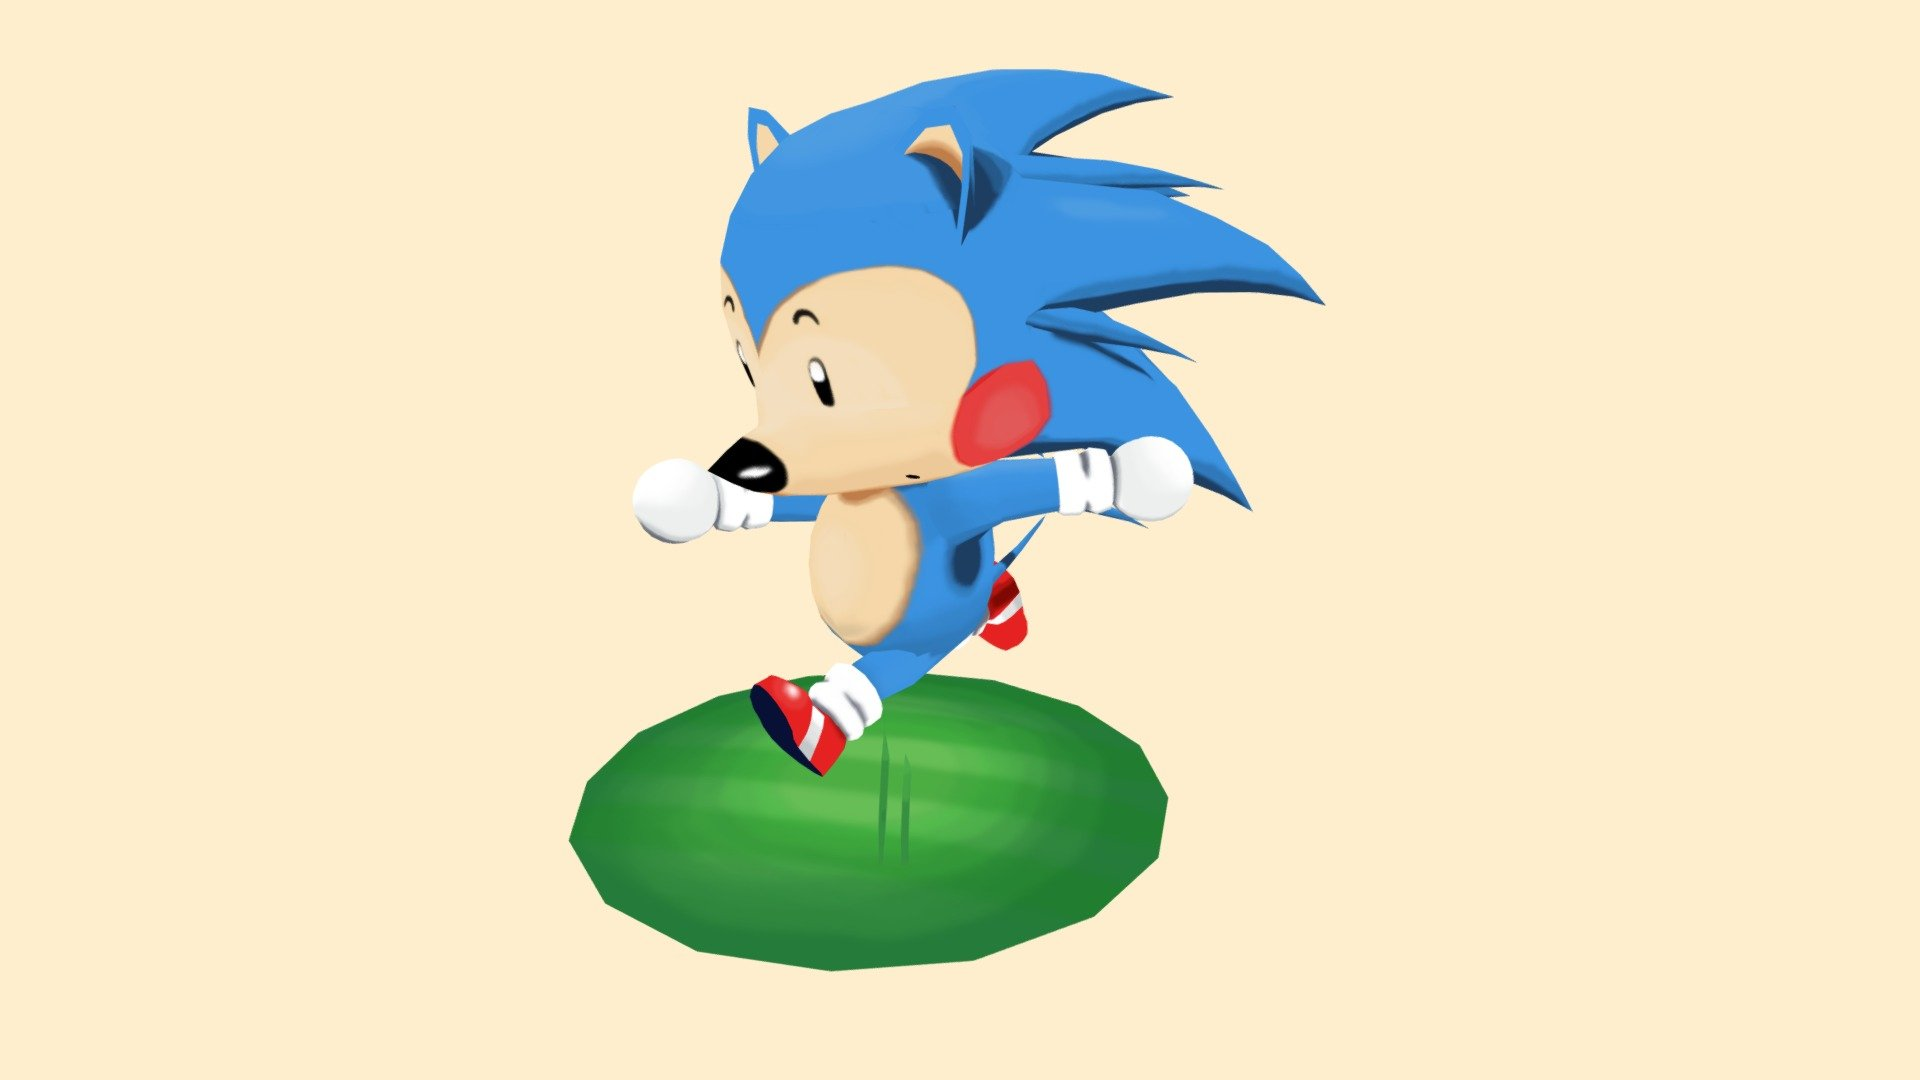 Sonic The Hedgehog Animal Crossing Style 3d Model By Zacharia Heatphoenix Heatphoenix Ec64465 Sketchfab